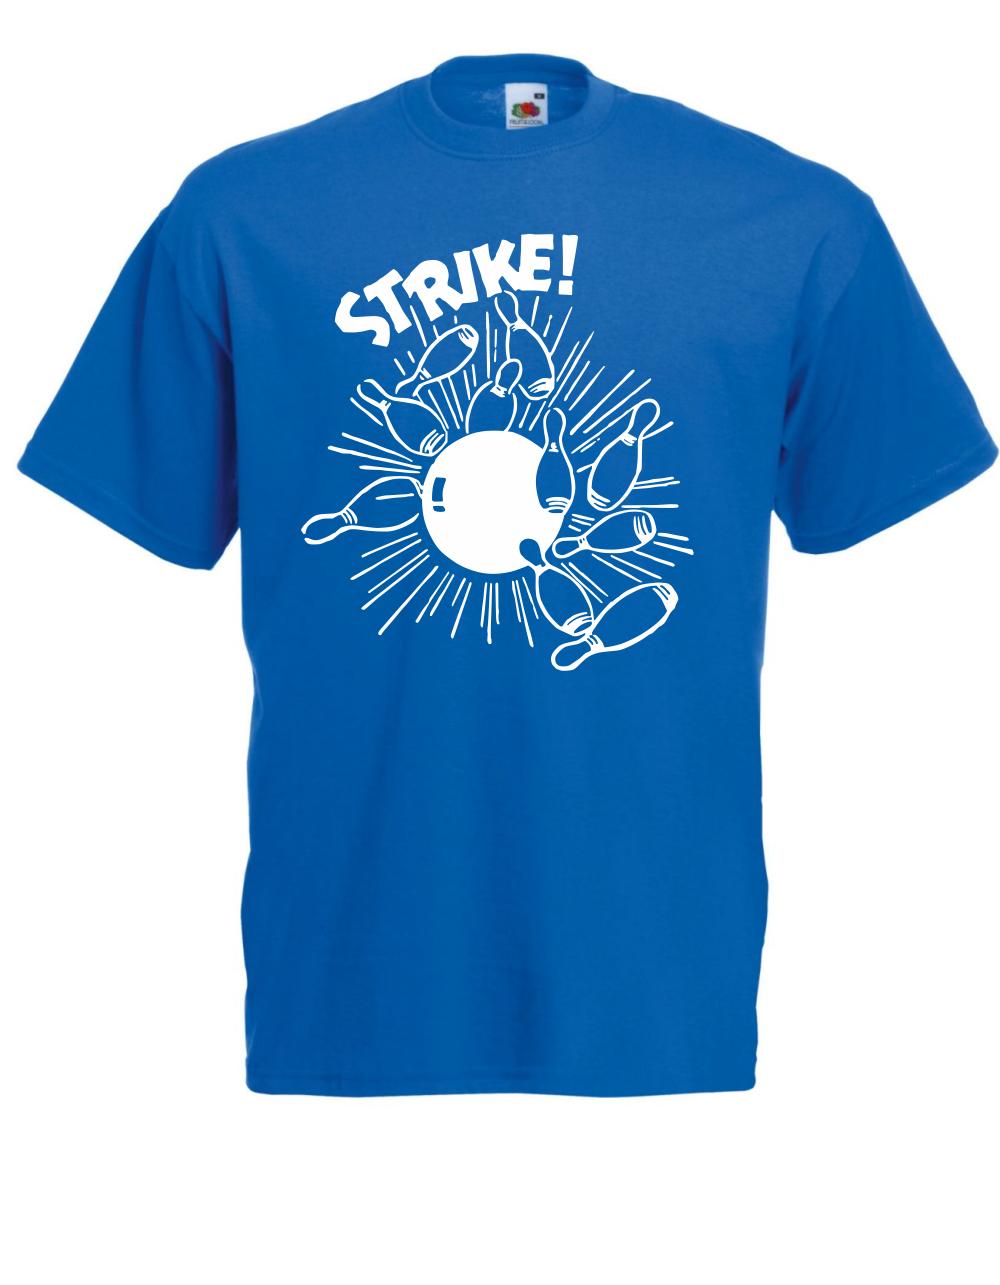 db4111ef207d9 ... T-Shirt pour Hommes Bowling - - Bowling Strike I Prétentions I Fun I  Drôle ...